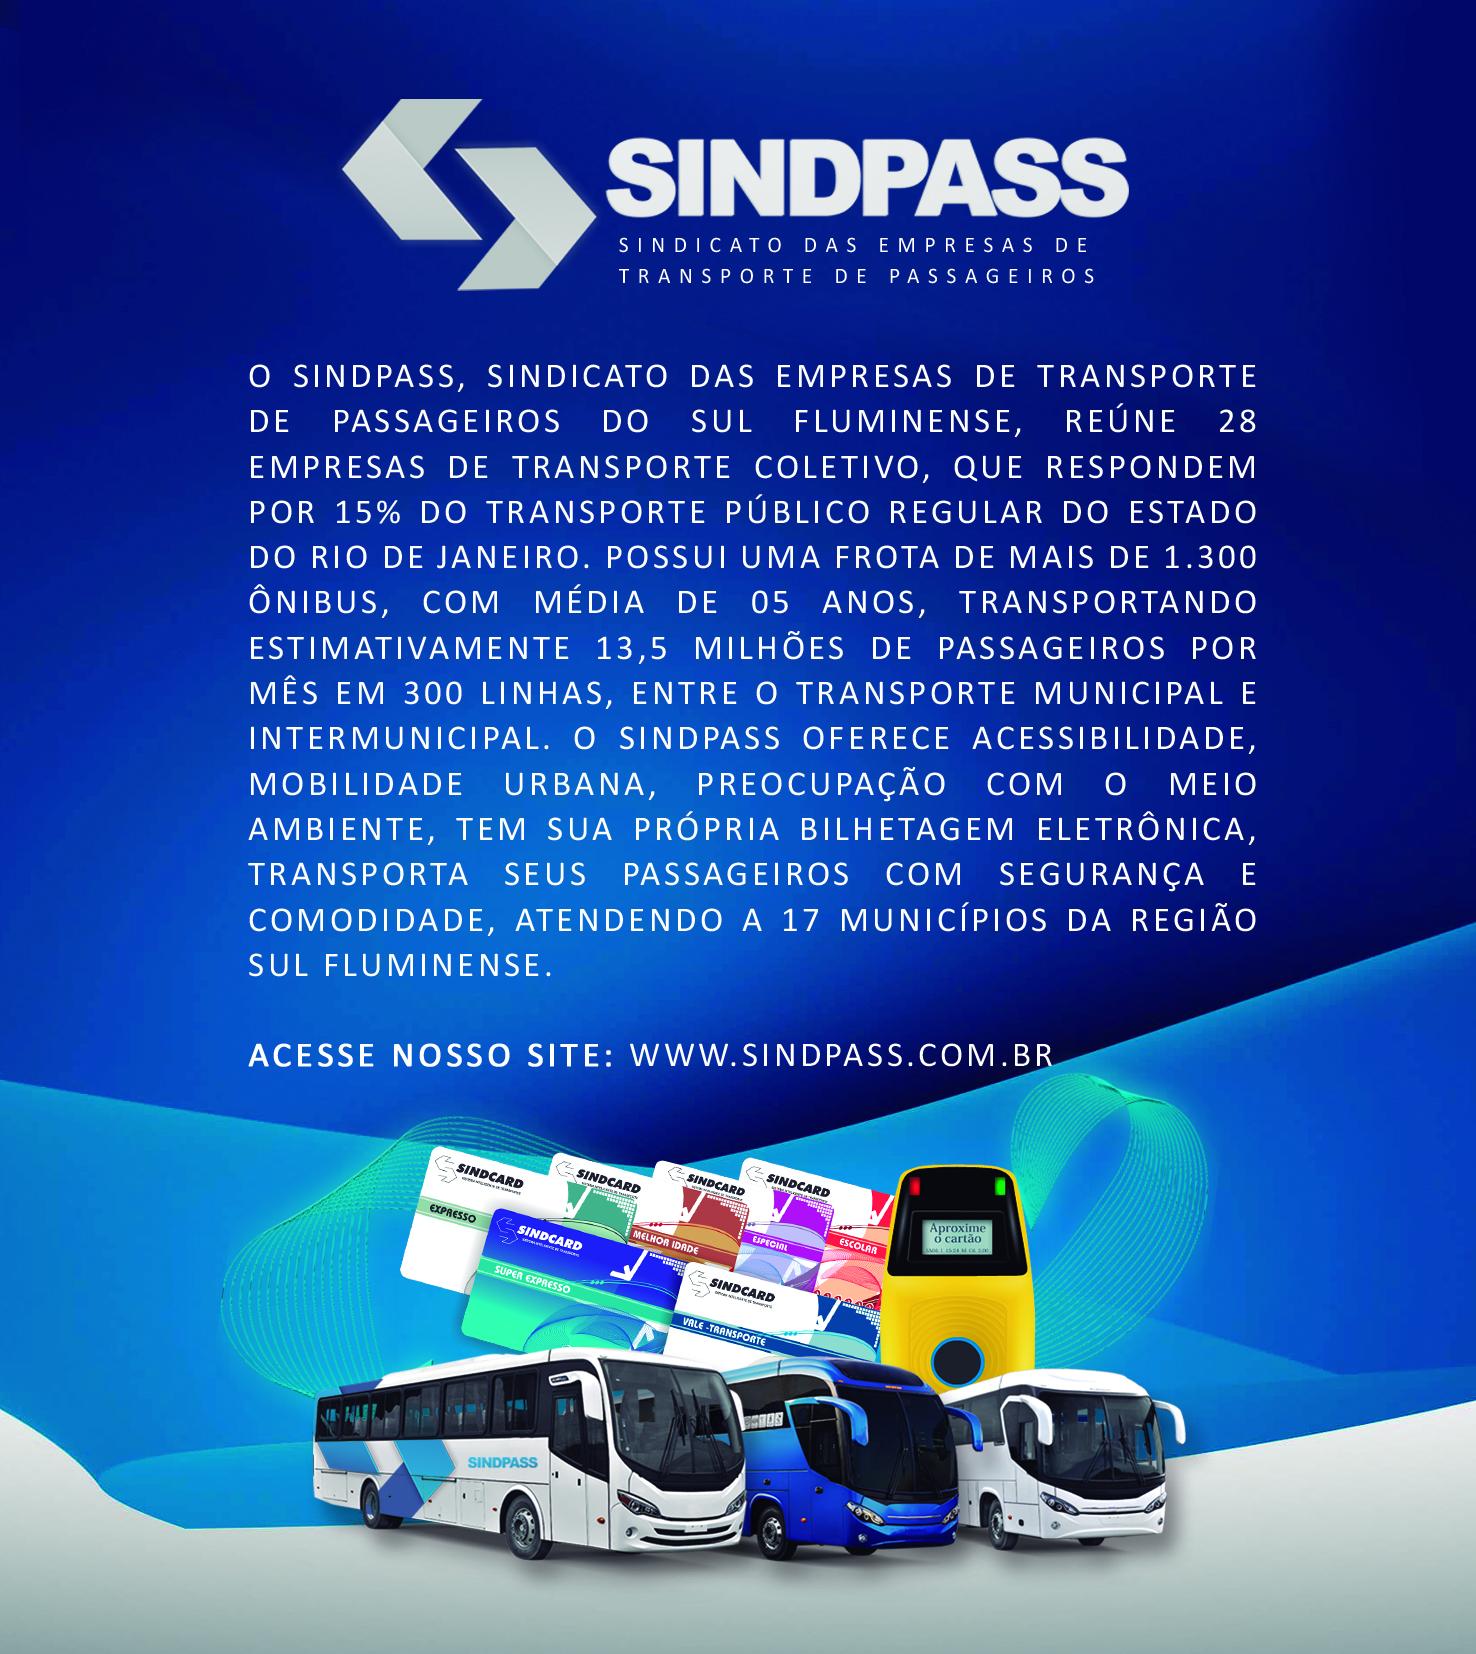 SindPass VR/BM